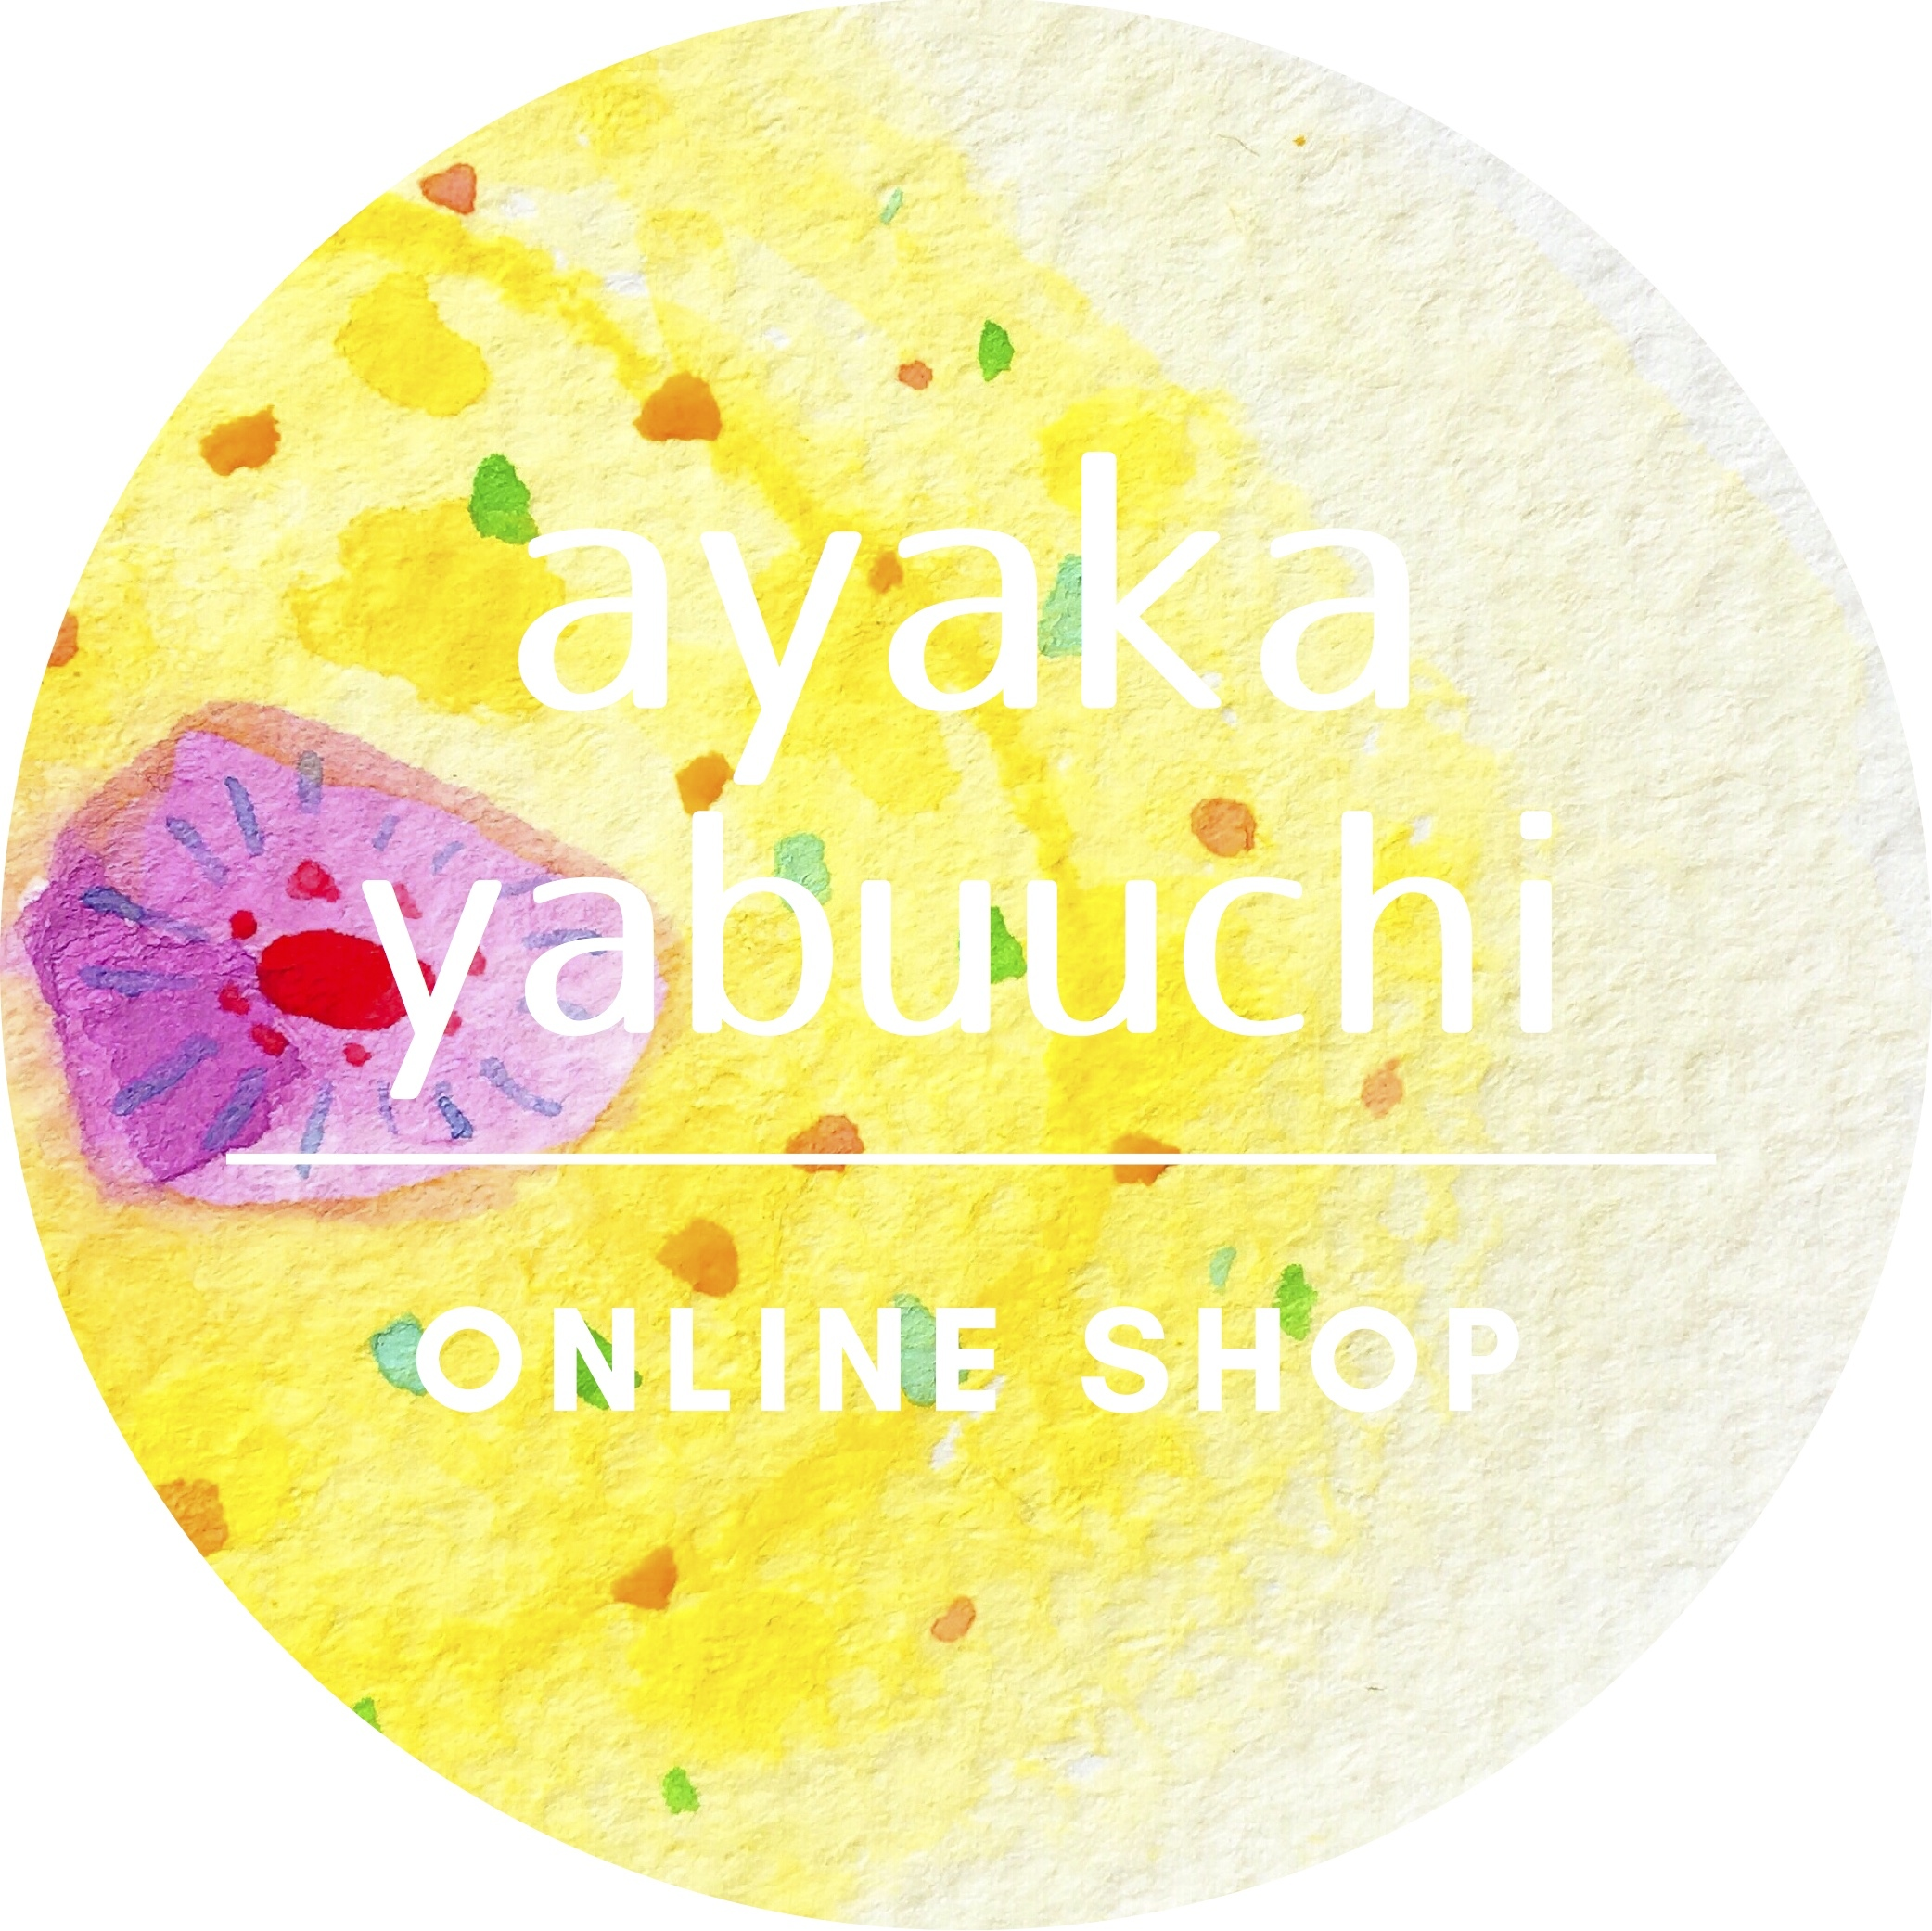 ayaka yabuuchi